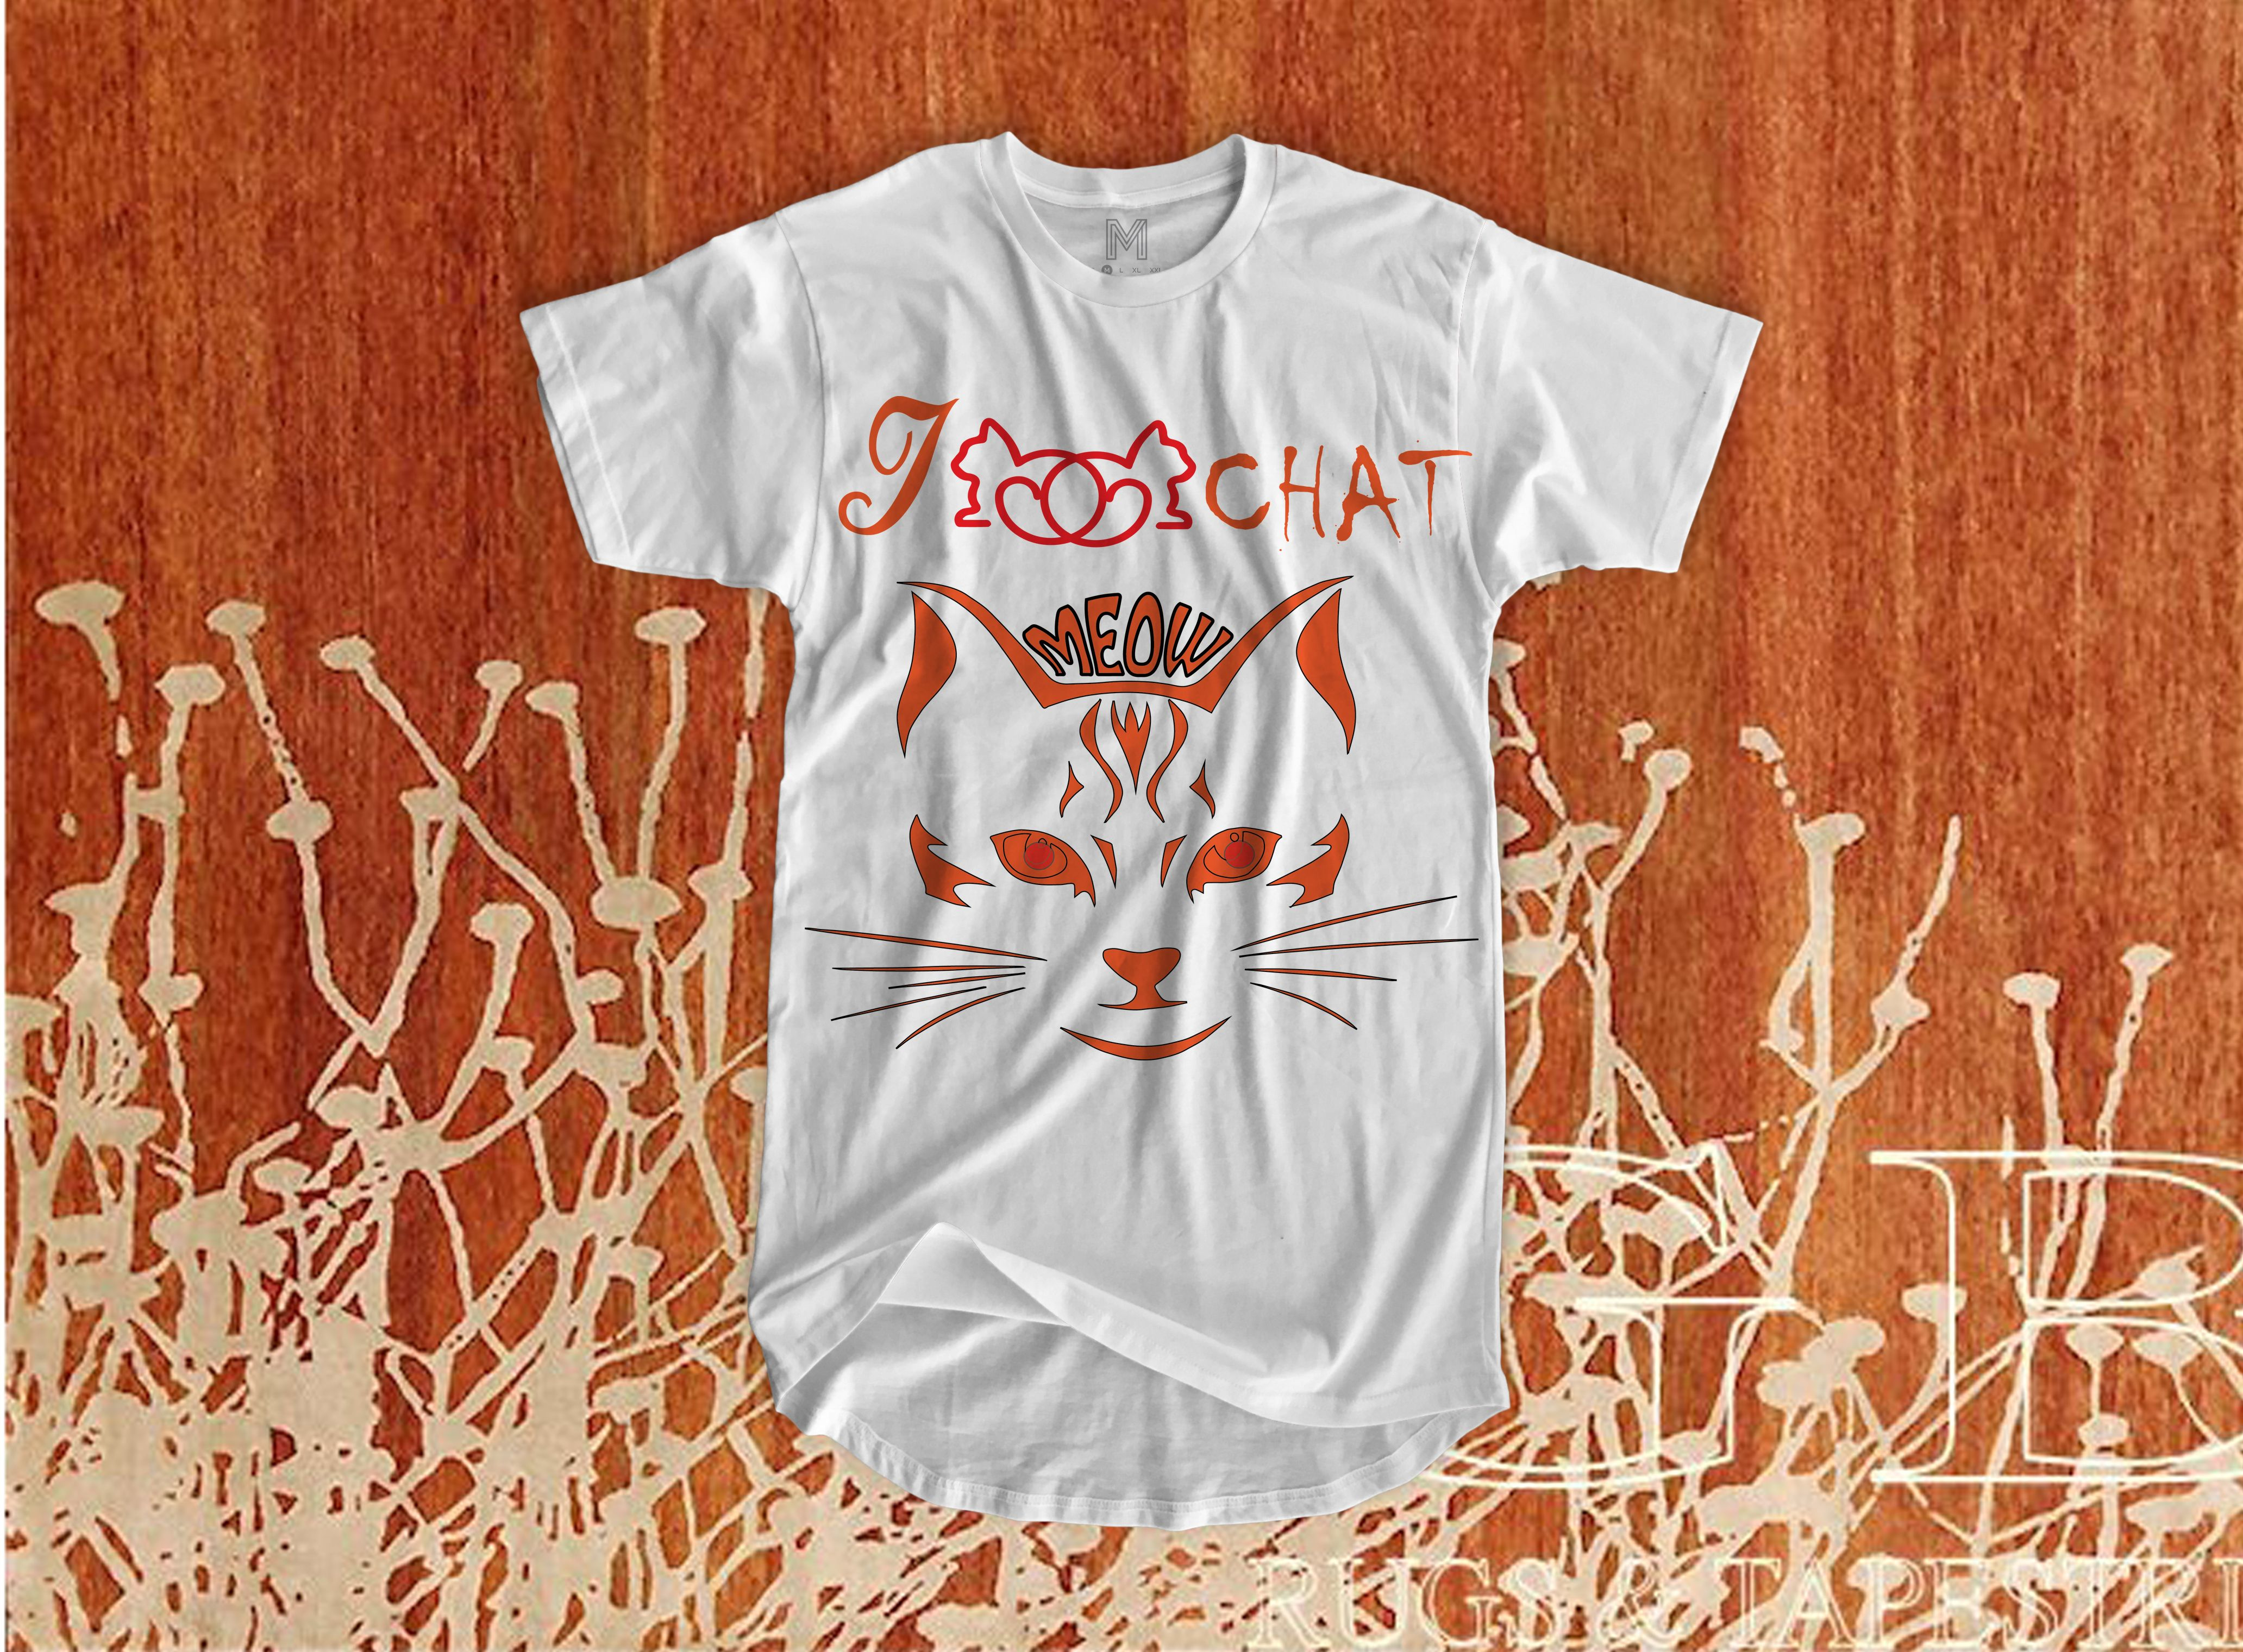 eb35be0a Free T Shirt Designer Online - DREAMWORKS